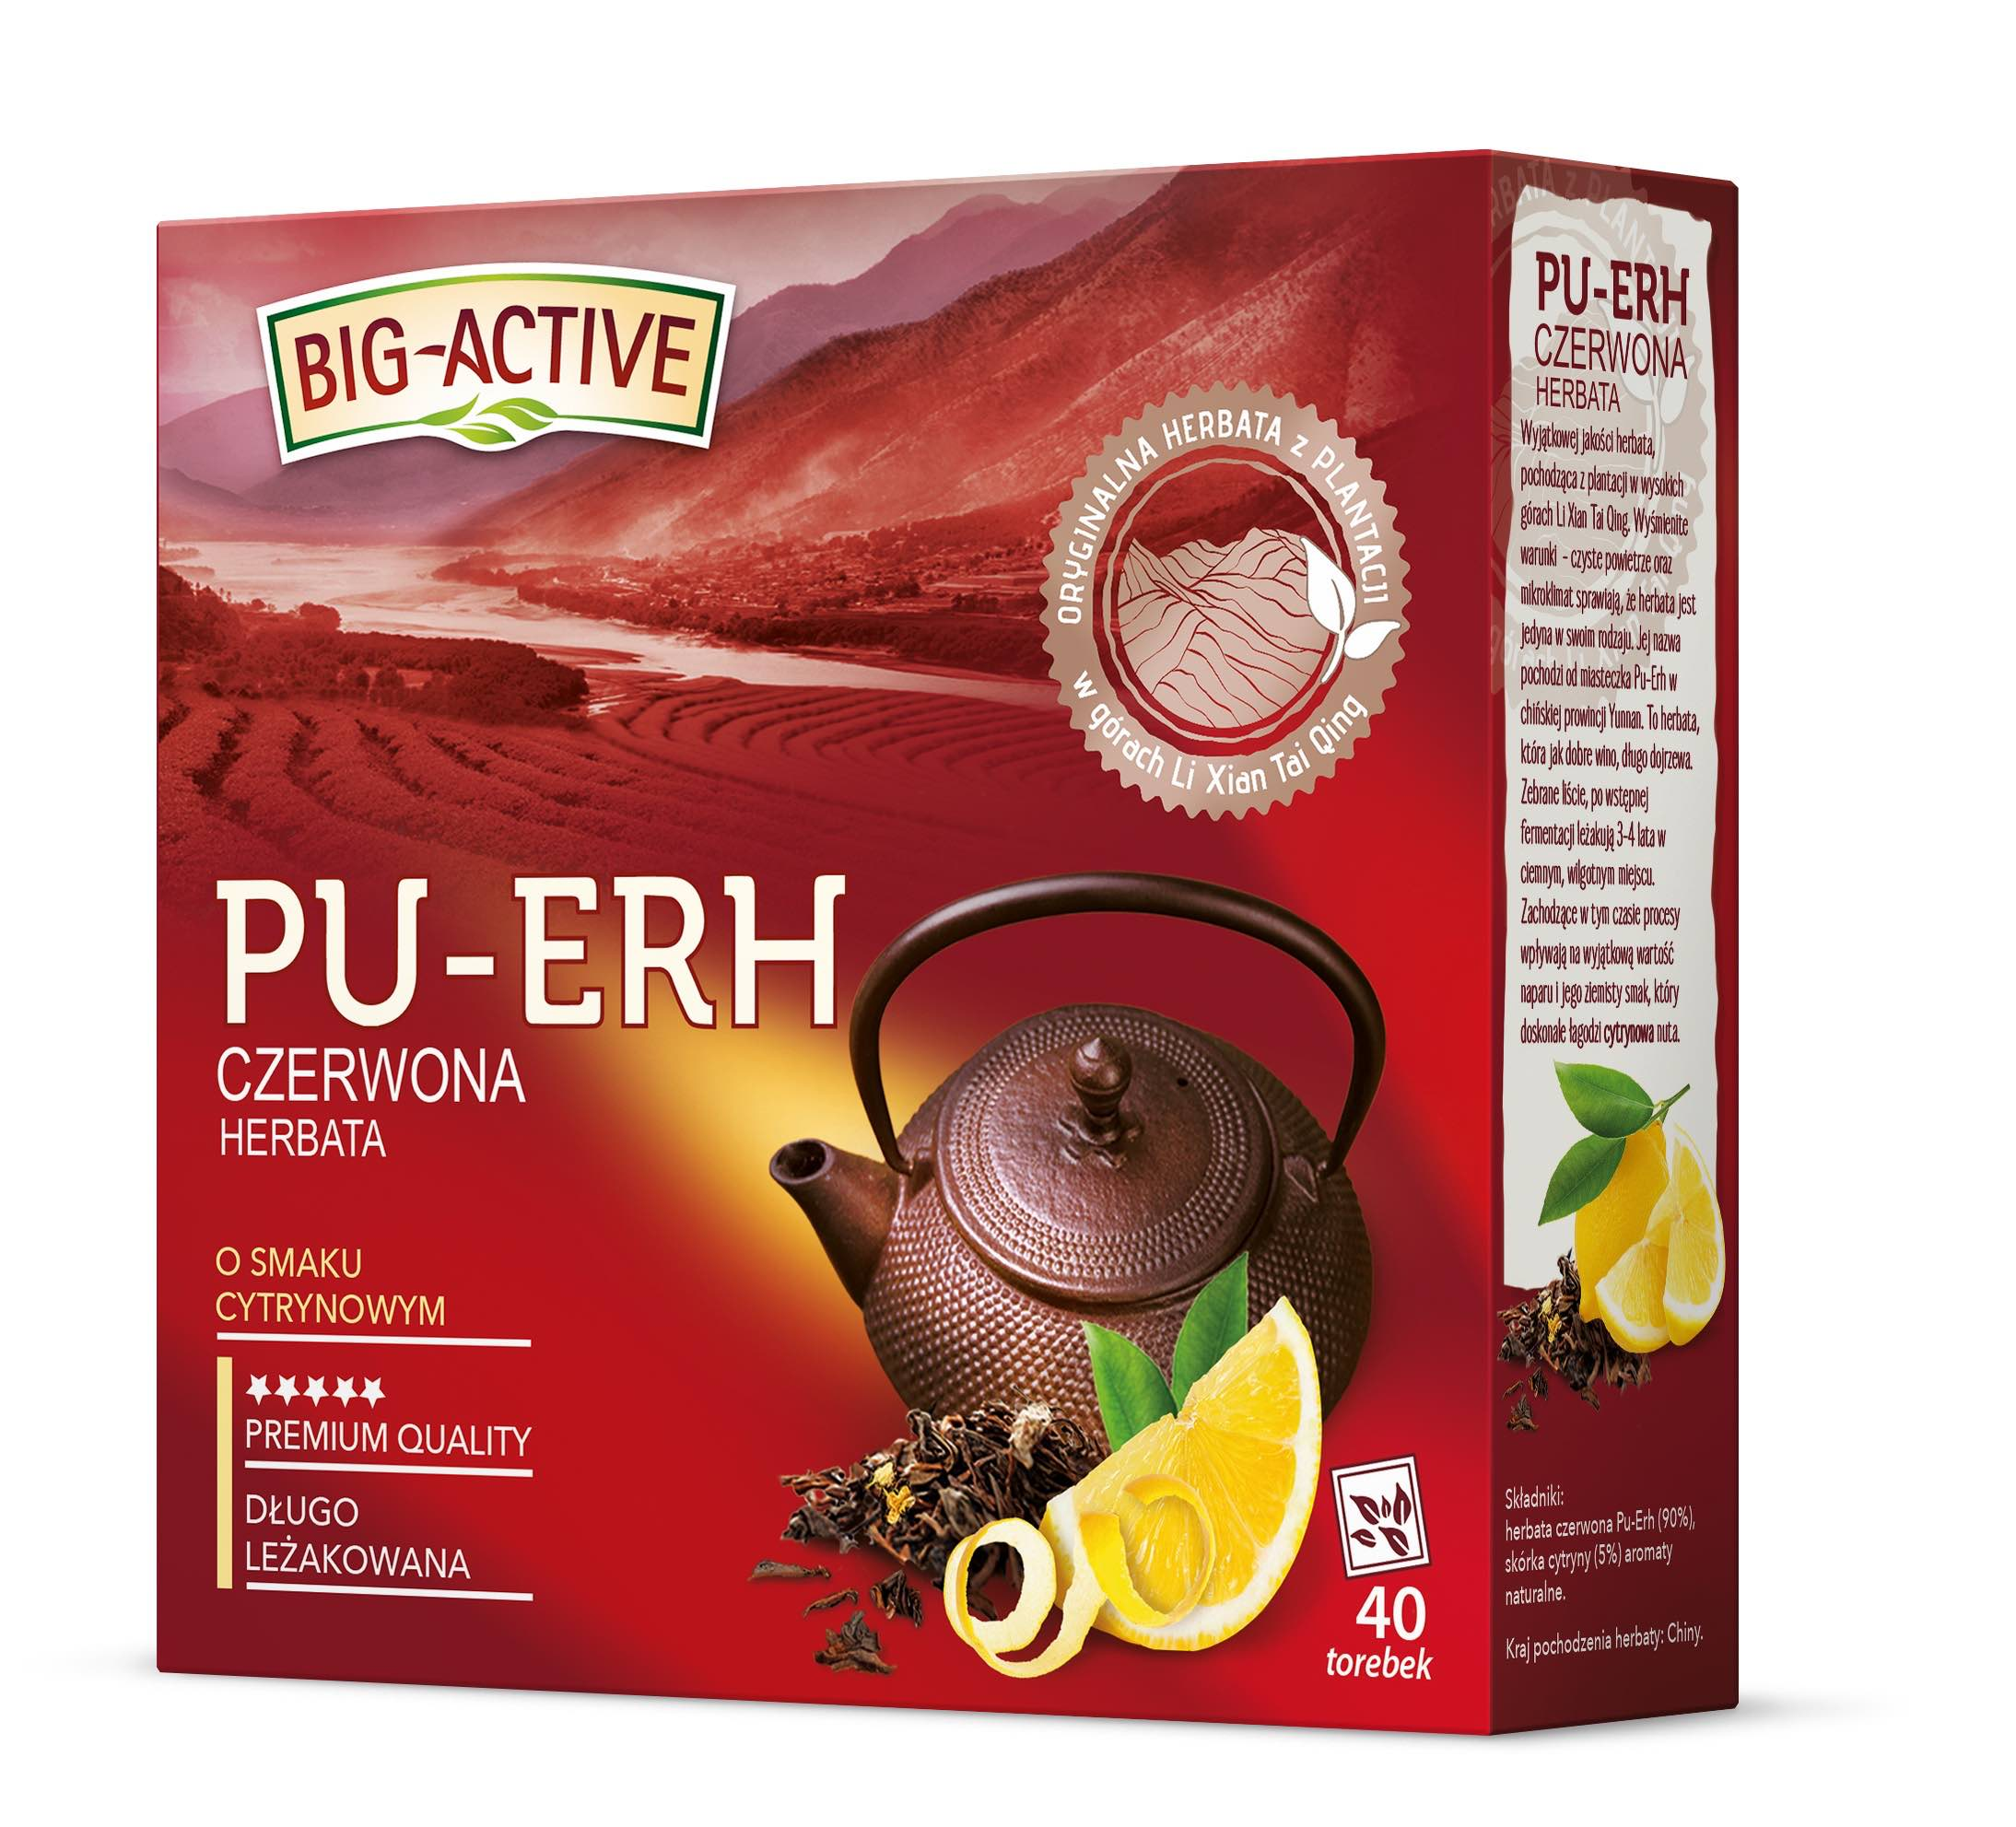 Czerwona herbata Pu-Erh marki Big-Active